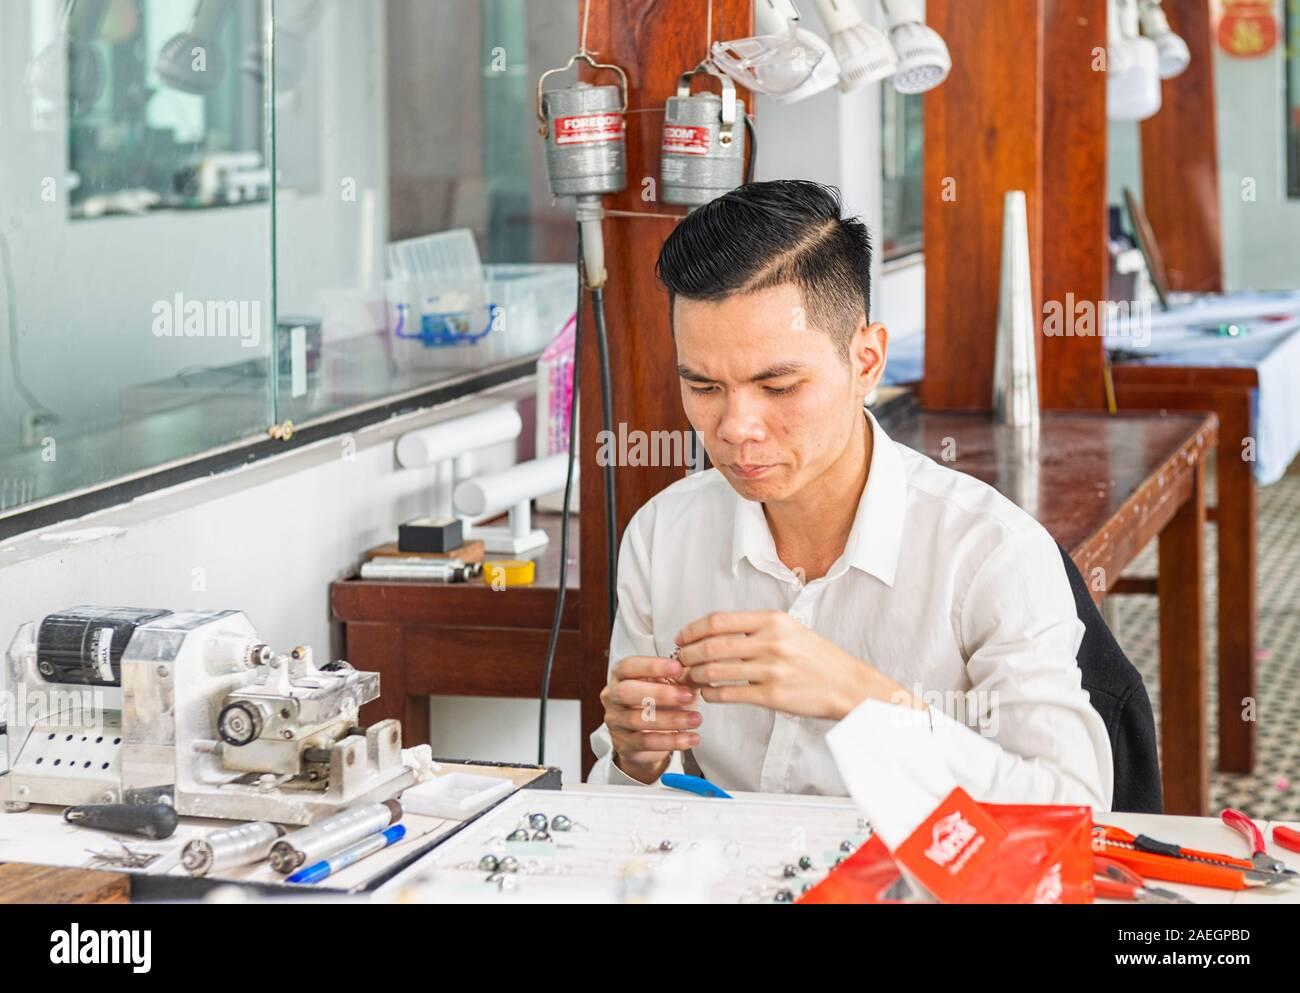 Legend Pearl Quang Ninh thanh pha Halong Bay Vietnam, Vietnamese man making pearl jewellery Stock Photo